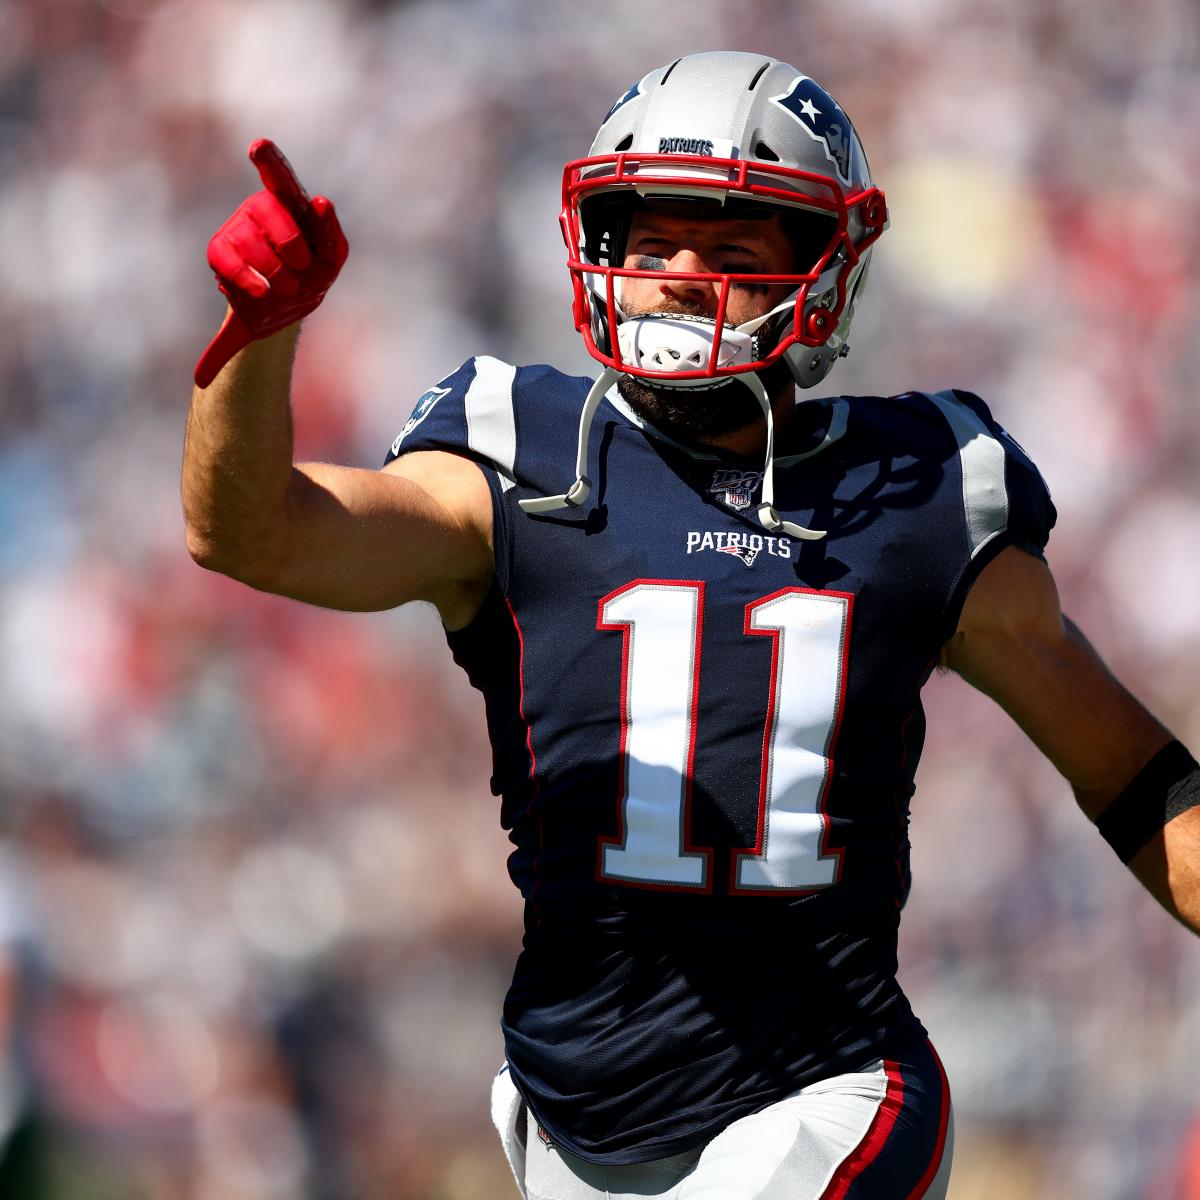 Patriots notes: WR Julian Edelman undergoes shoulder